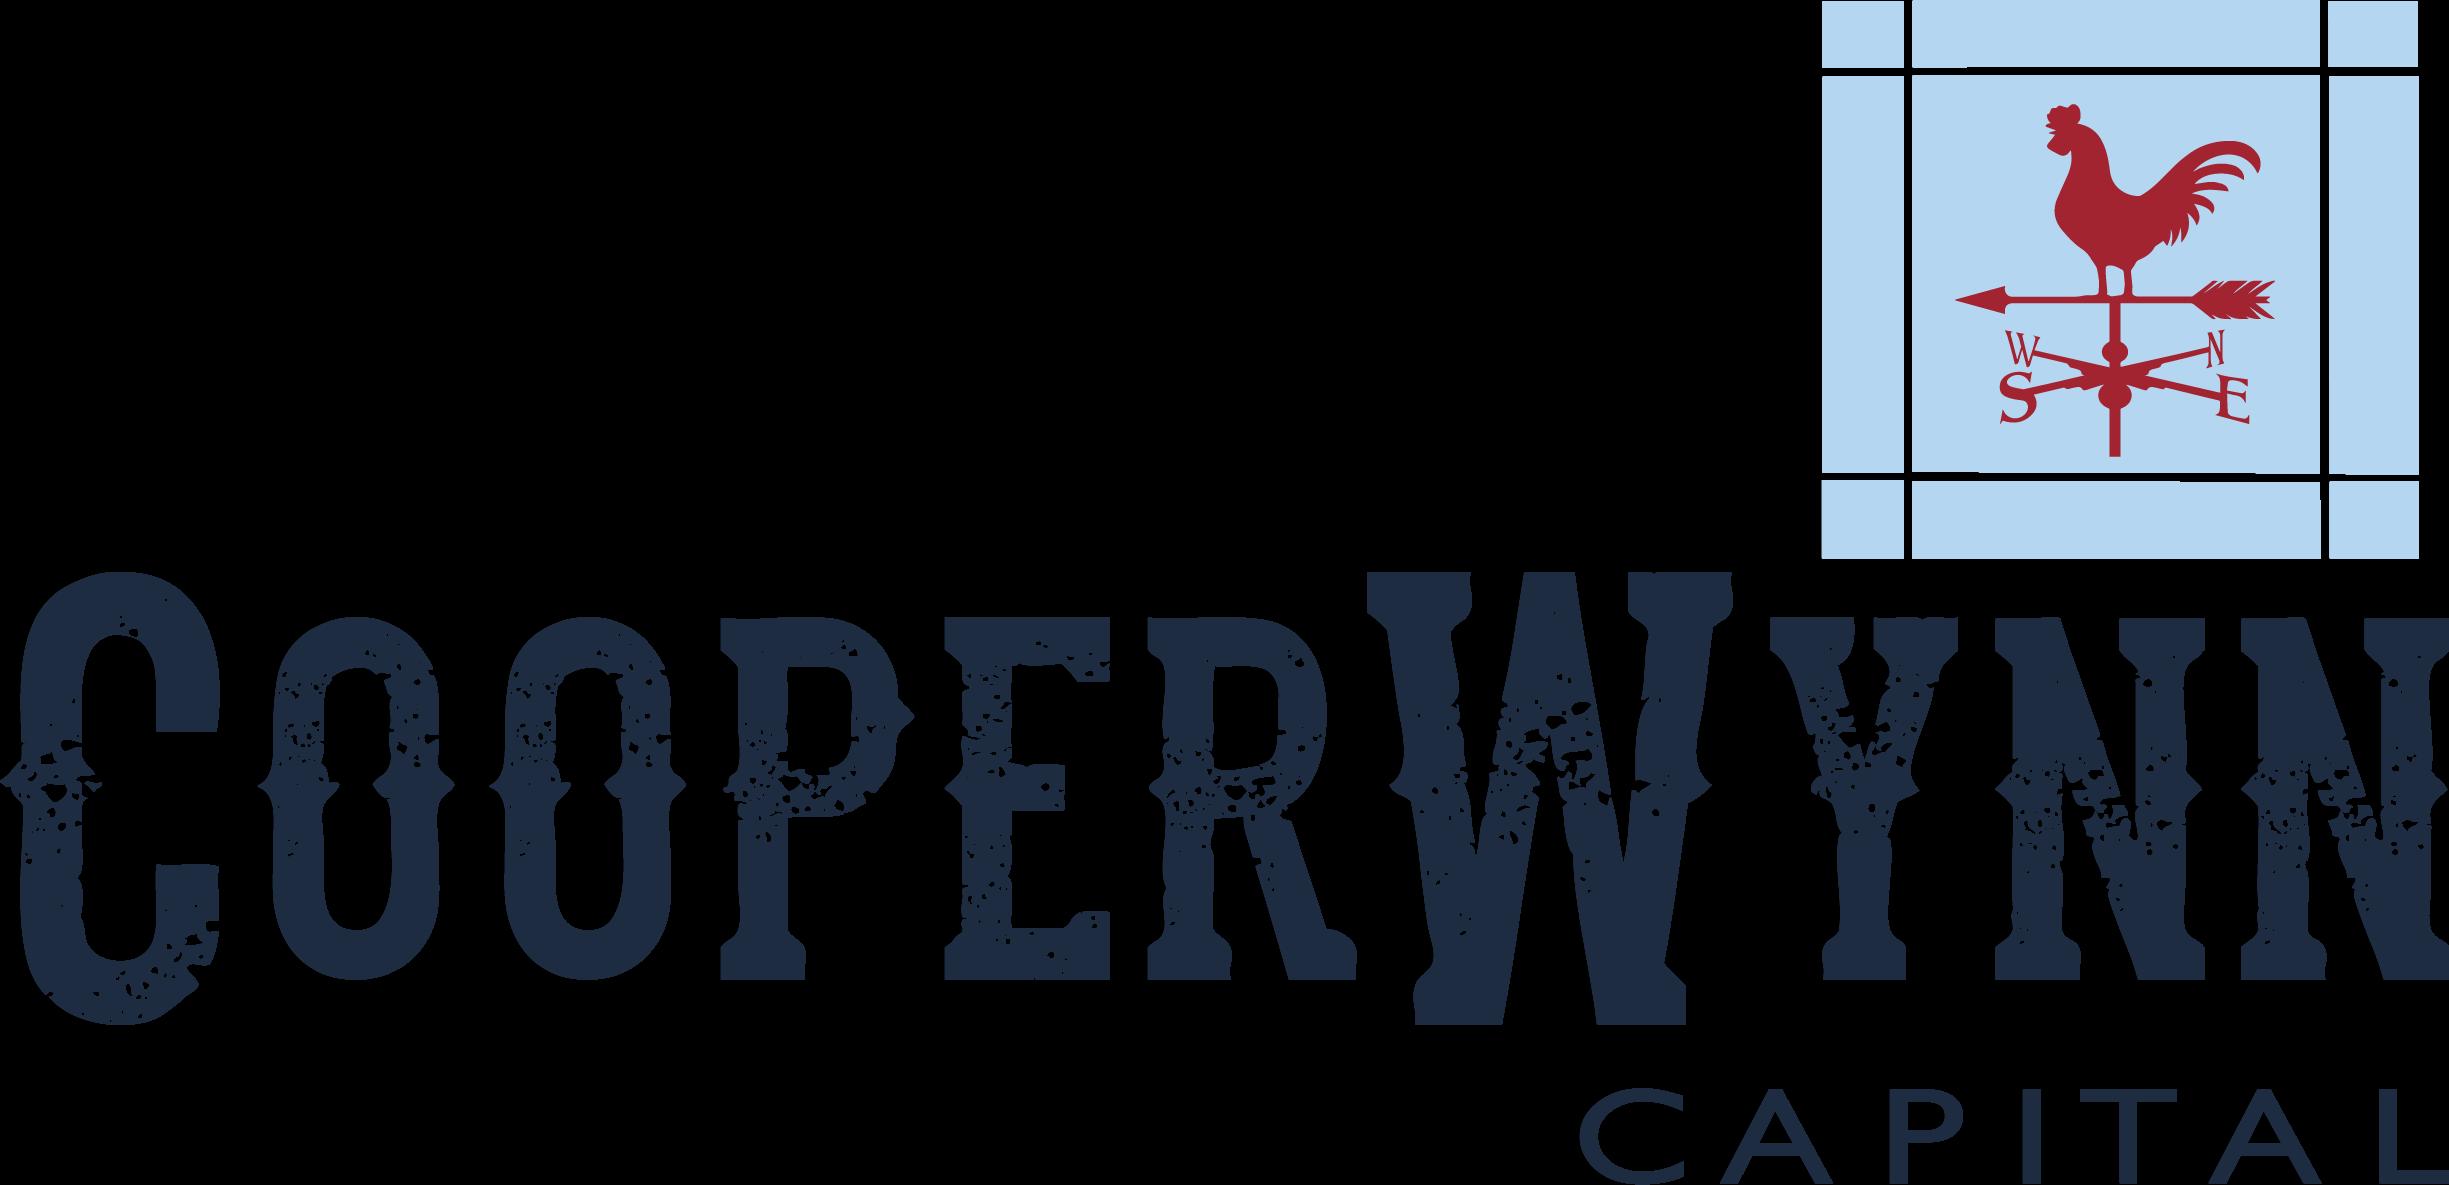 CooperWynn Capital